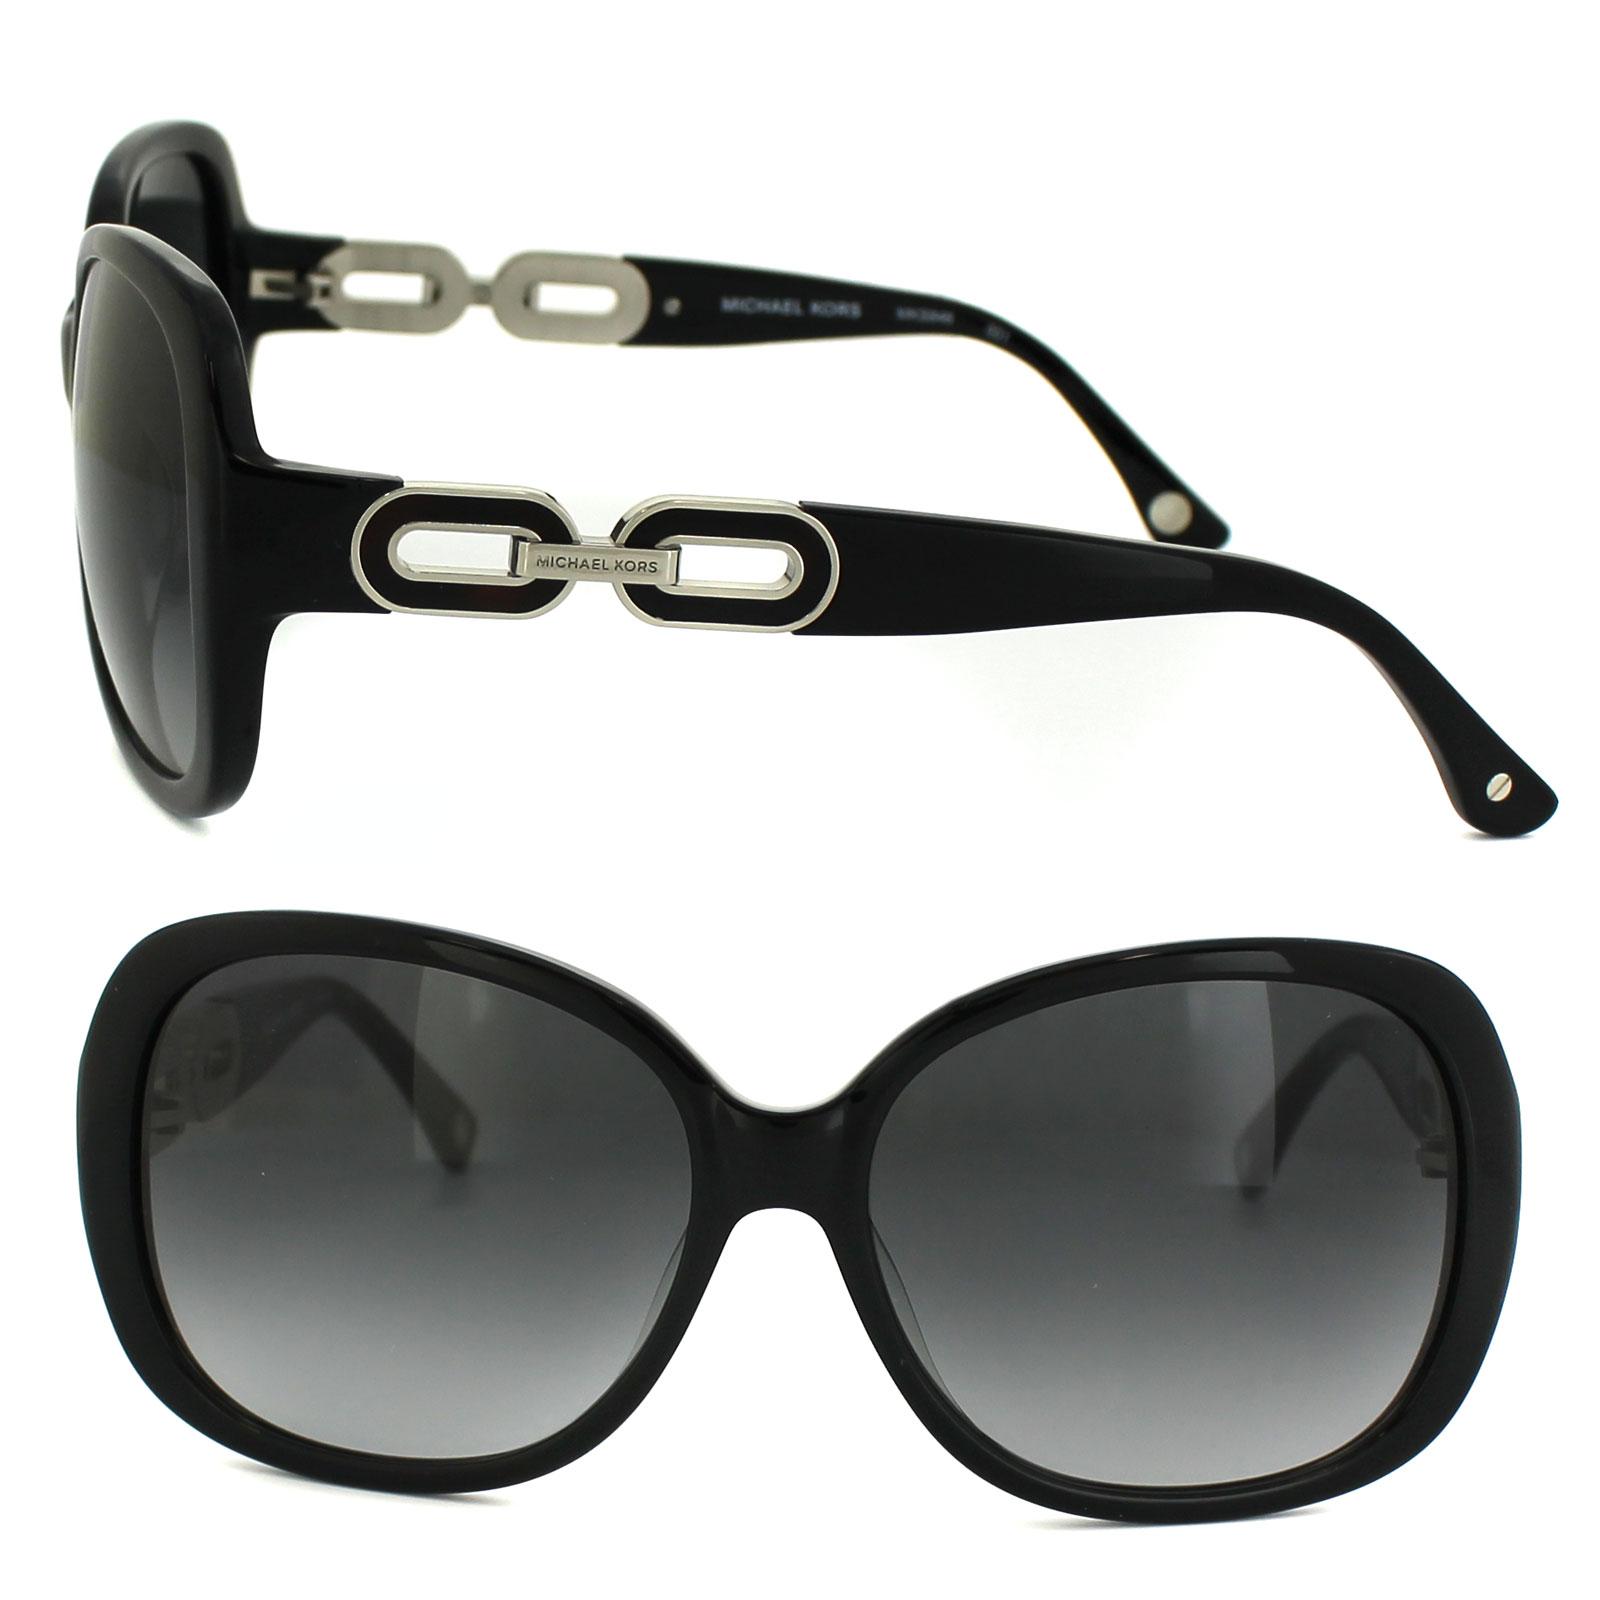 17fd790211 Michael Kors Anna MKS846 Sunglasses Thumbnail 1 Michael Kors Anna MKS846 Sunglasses  Thumbnail 2 ...